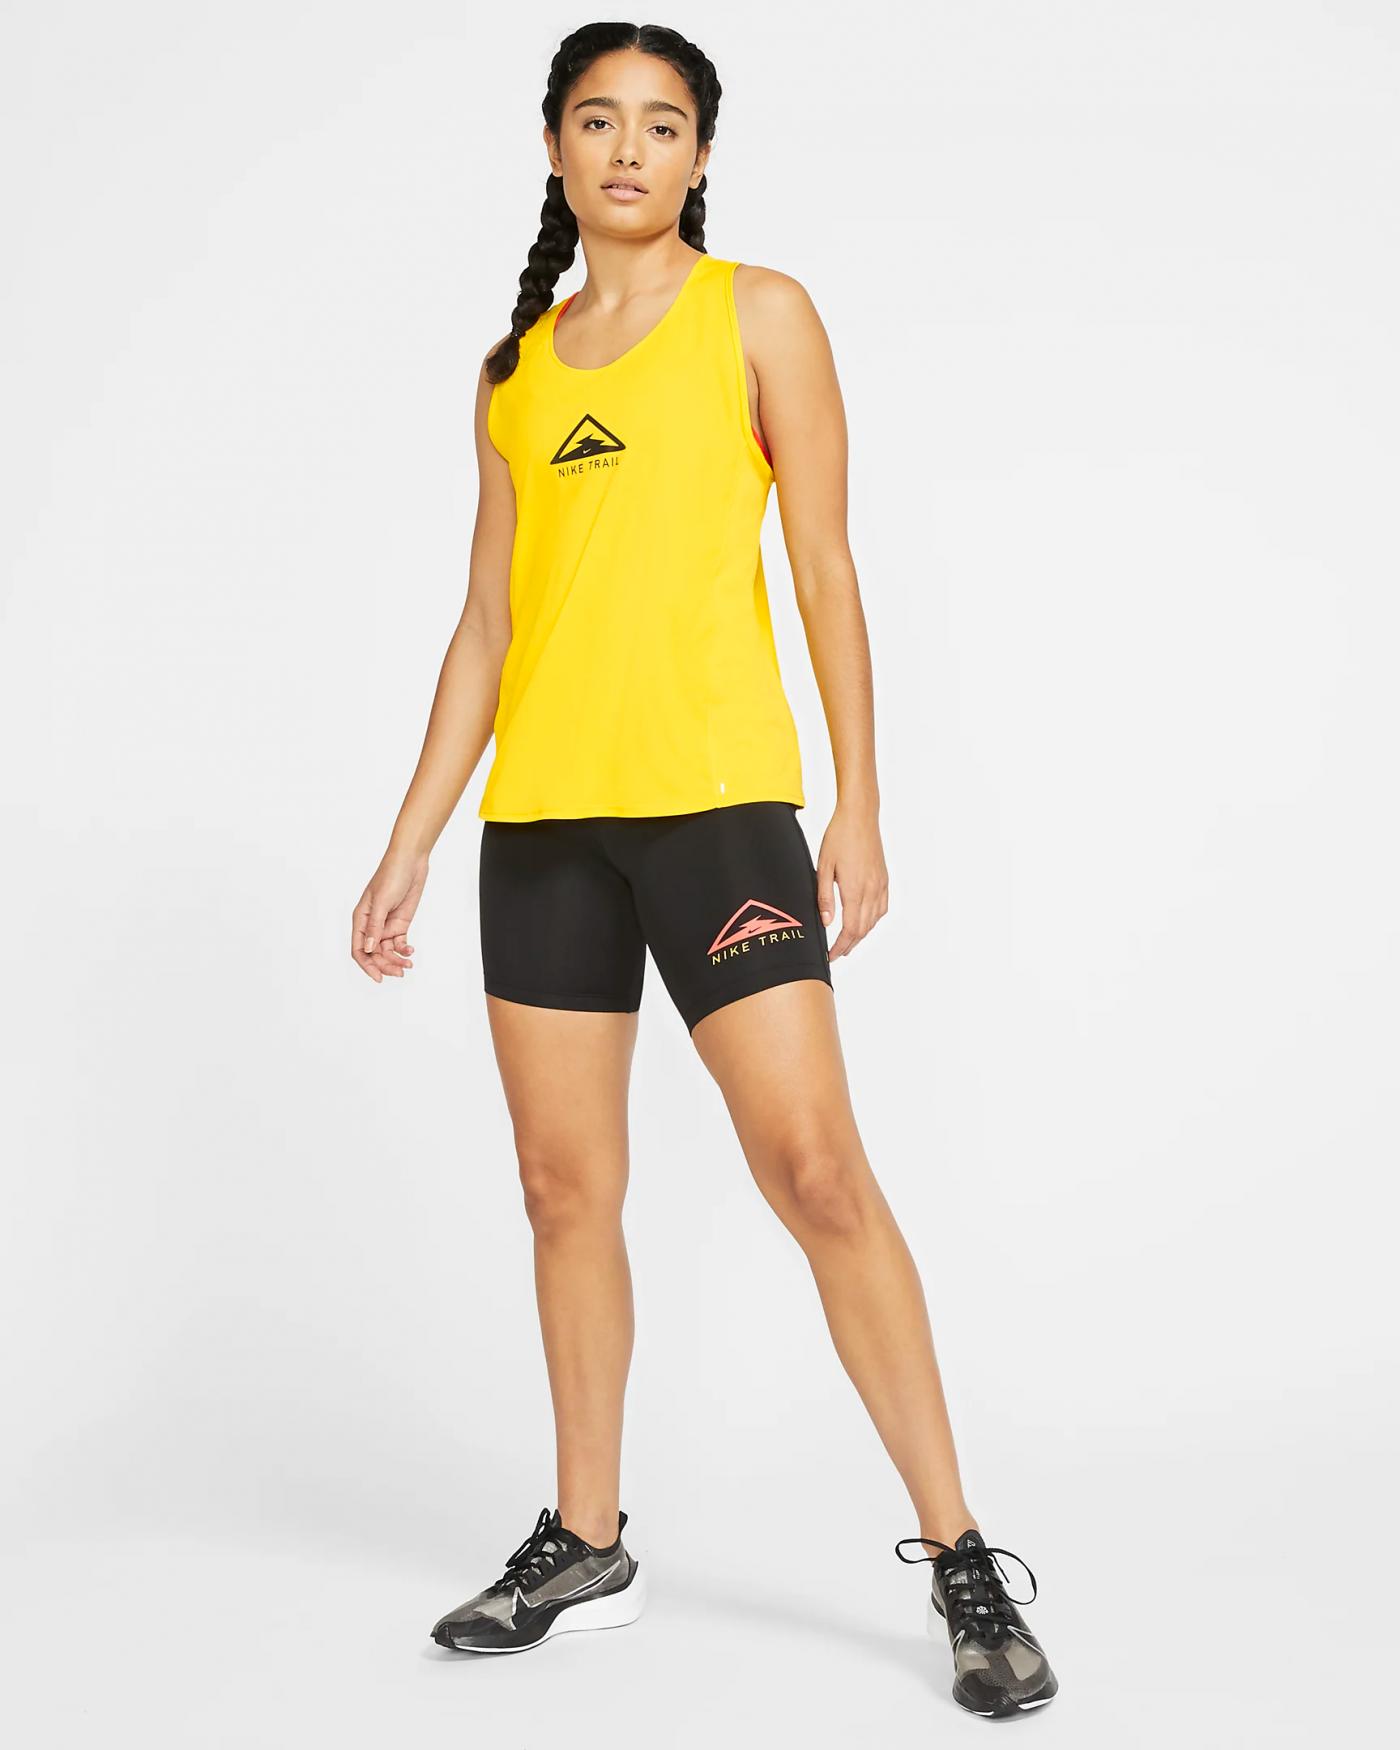 nike-trail-débardeur-short-femme-runpack